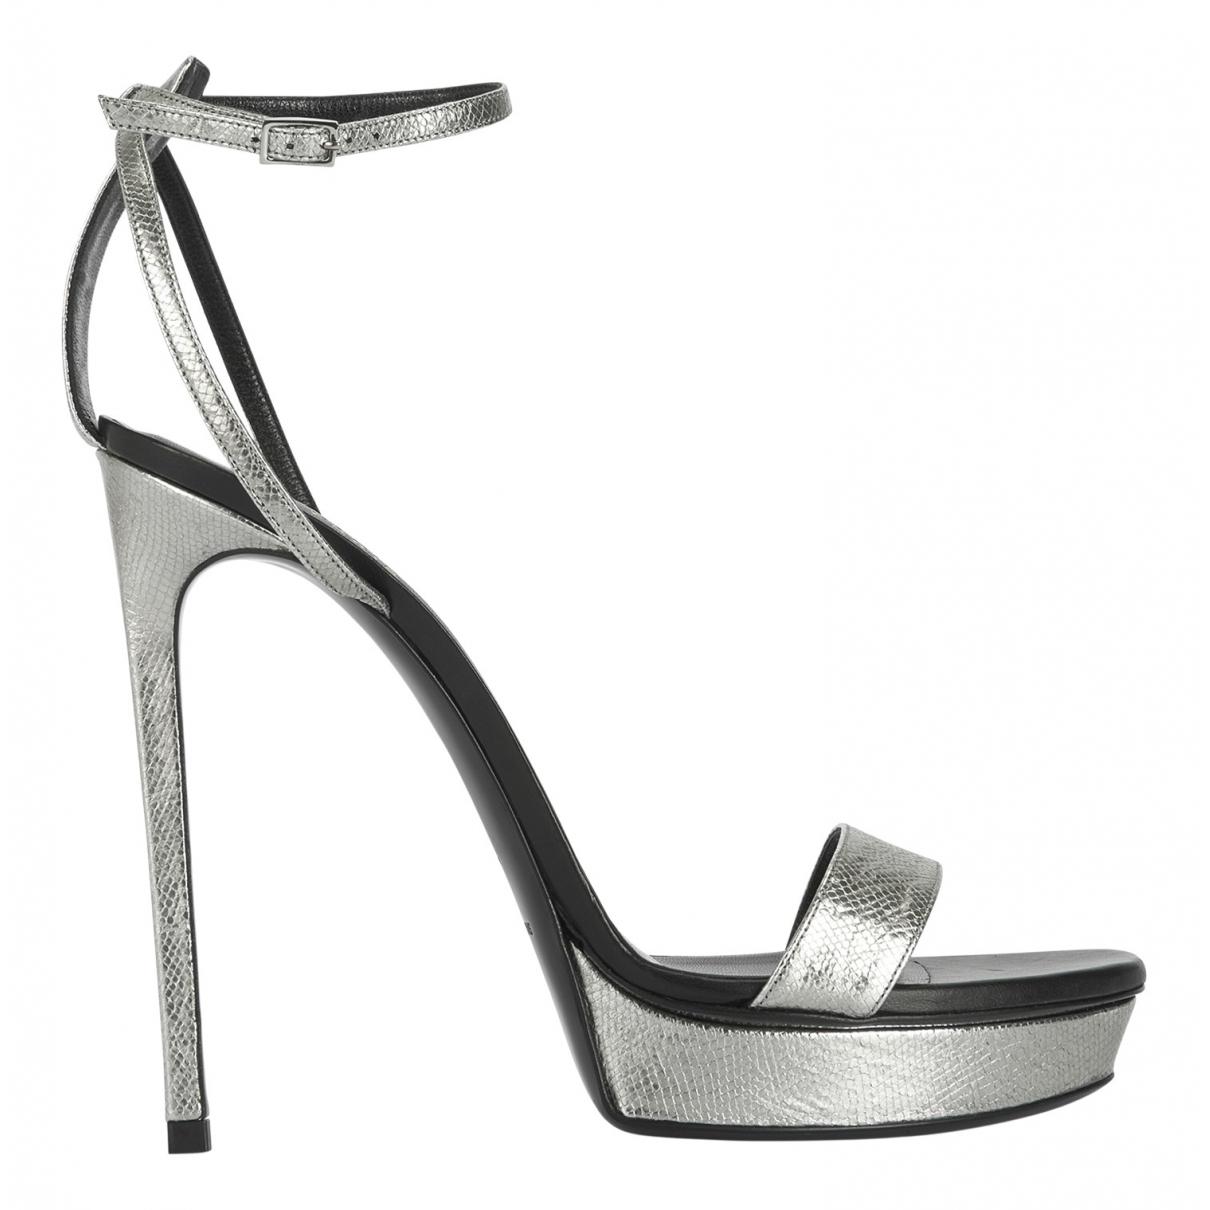 Saint Laurent N Silver Leather Sandals for Women 7.5 UK